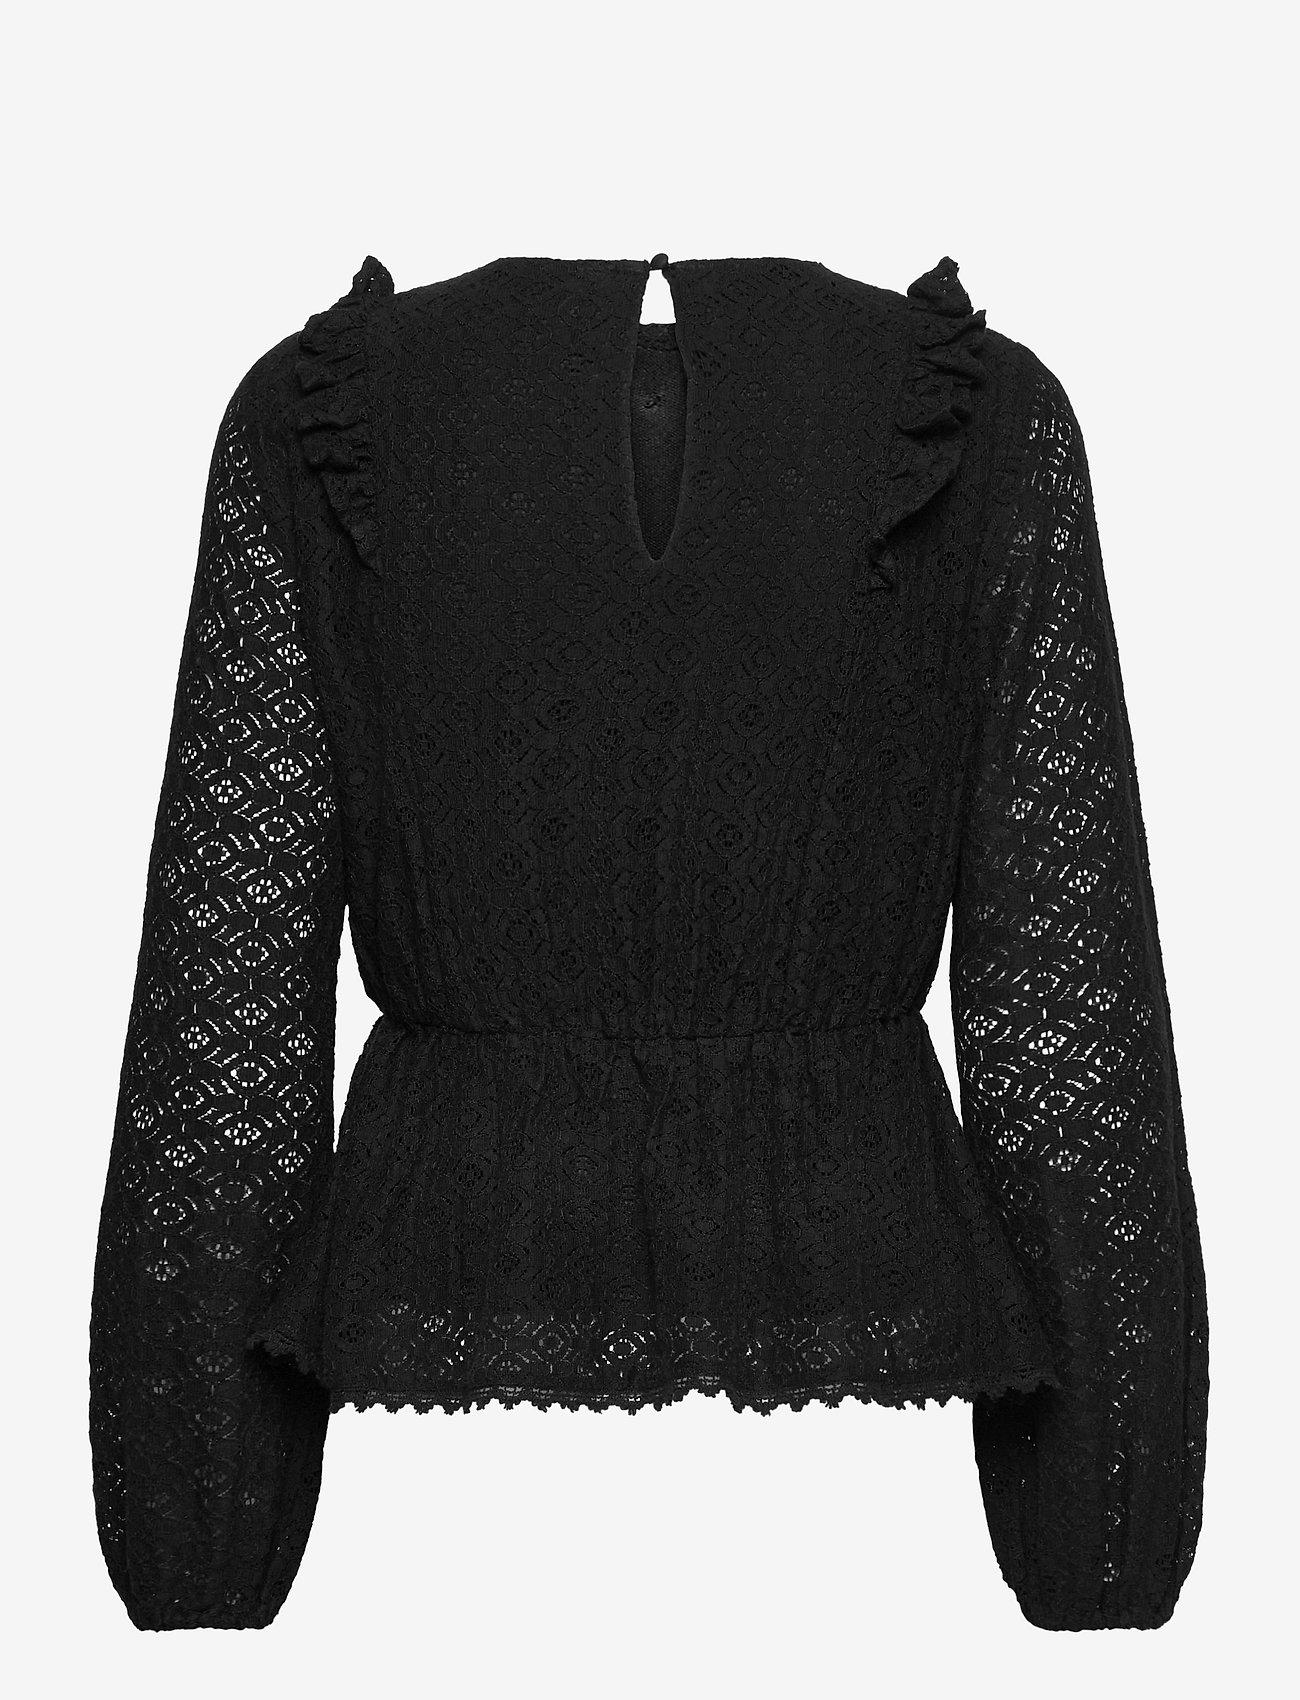 Vero Moda - VMHENNY LACE L/S PEPLUM TOP EXP - långärmade blusar - black - 1